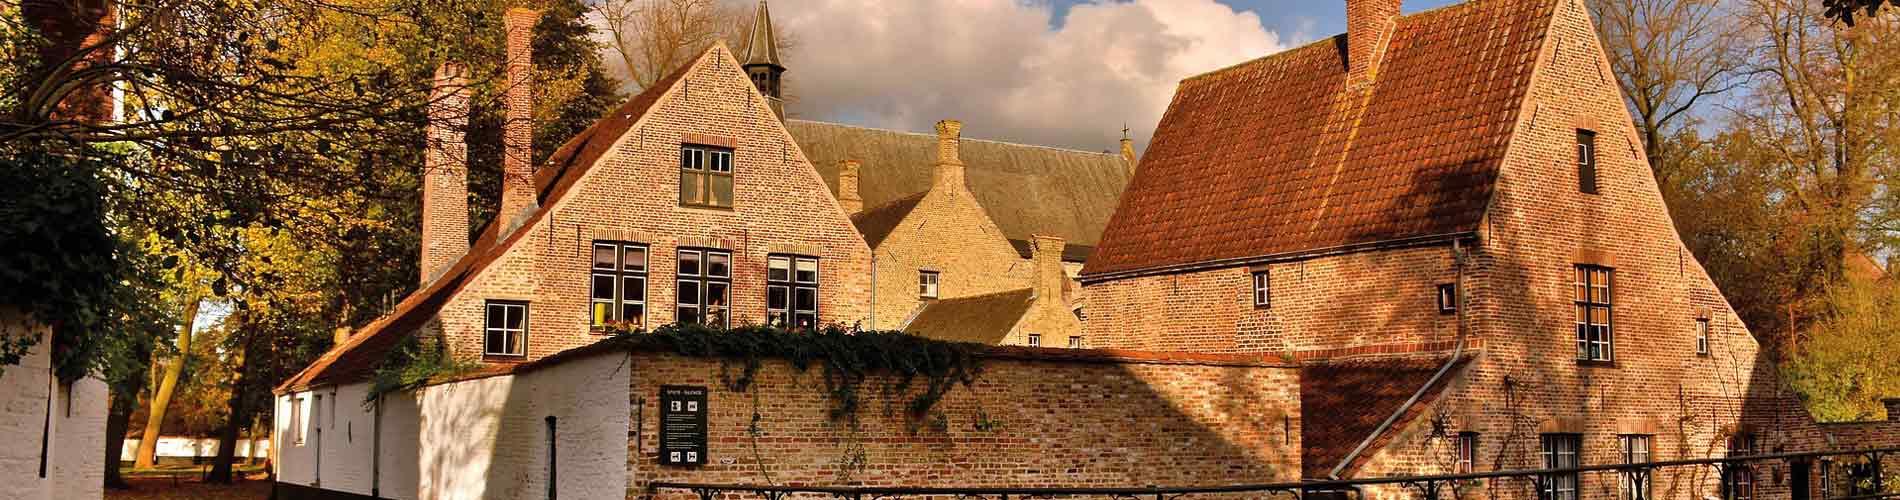 Blog_EuropeanCapitalCulture_Bruges_1900x500_Q120